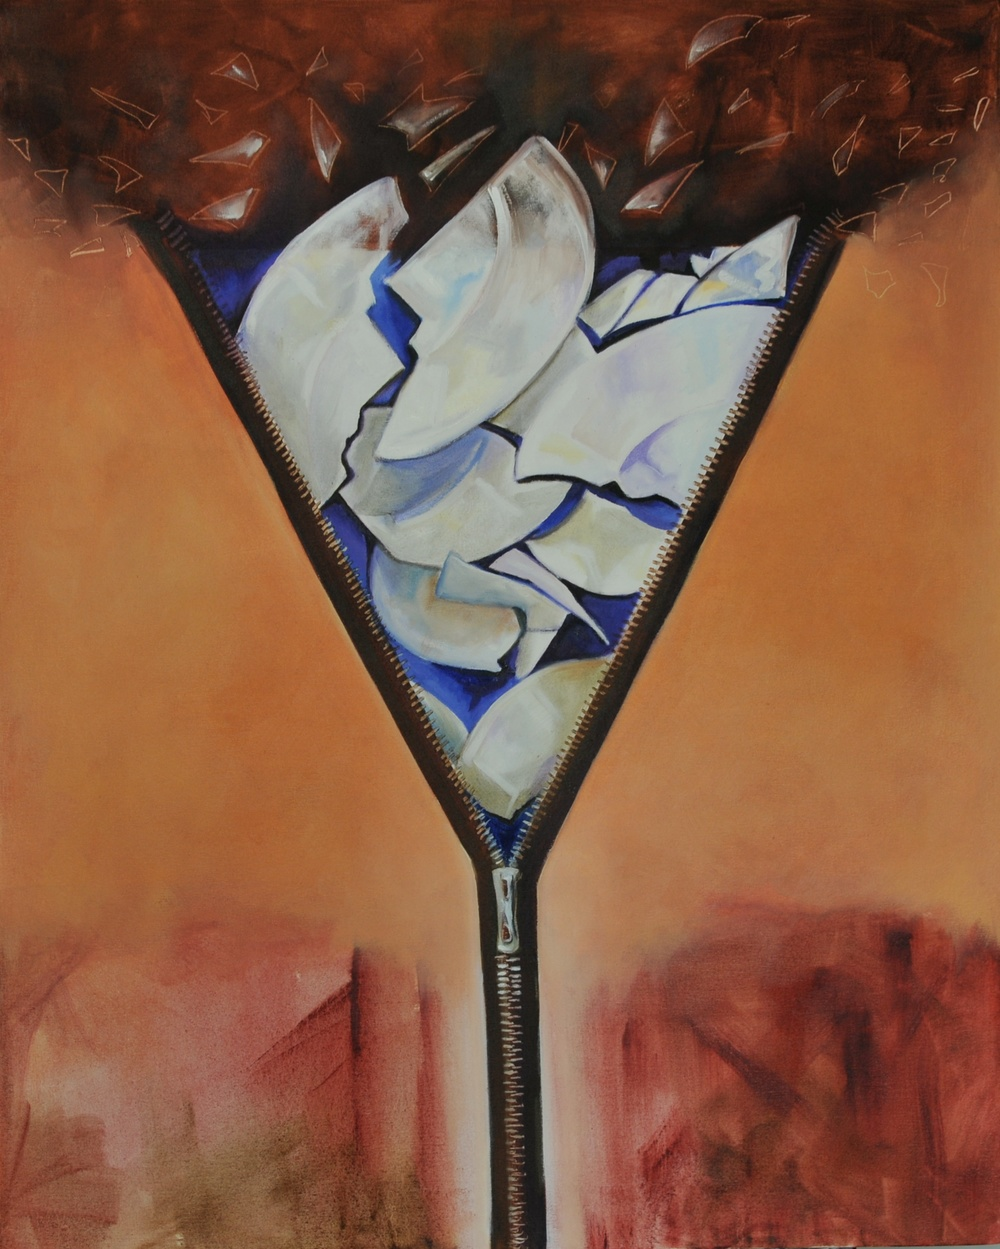 Zip Over Oil on Canvas 100 x 90 cm 2012